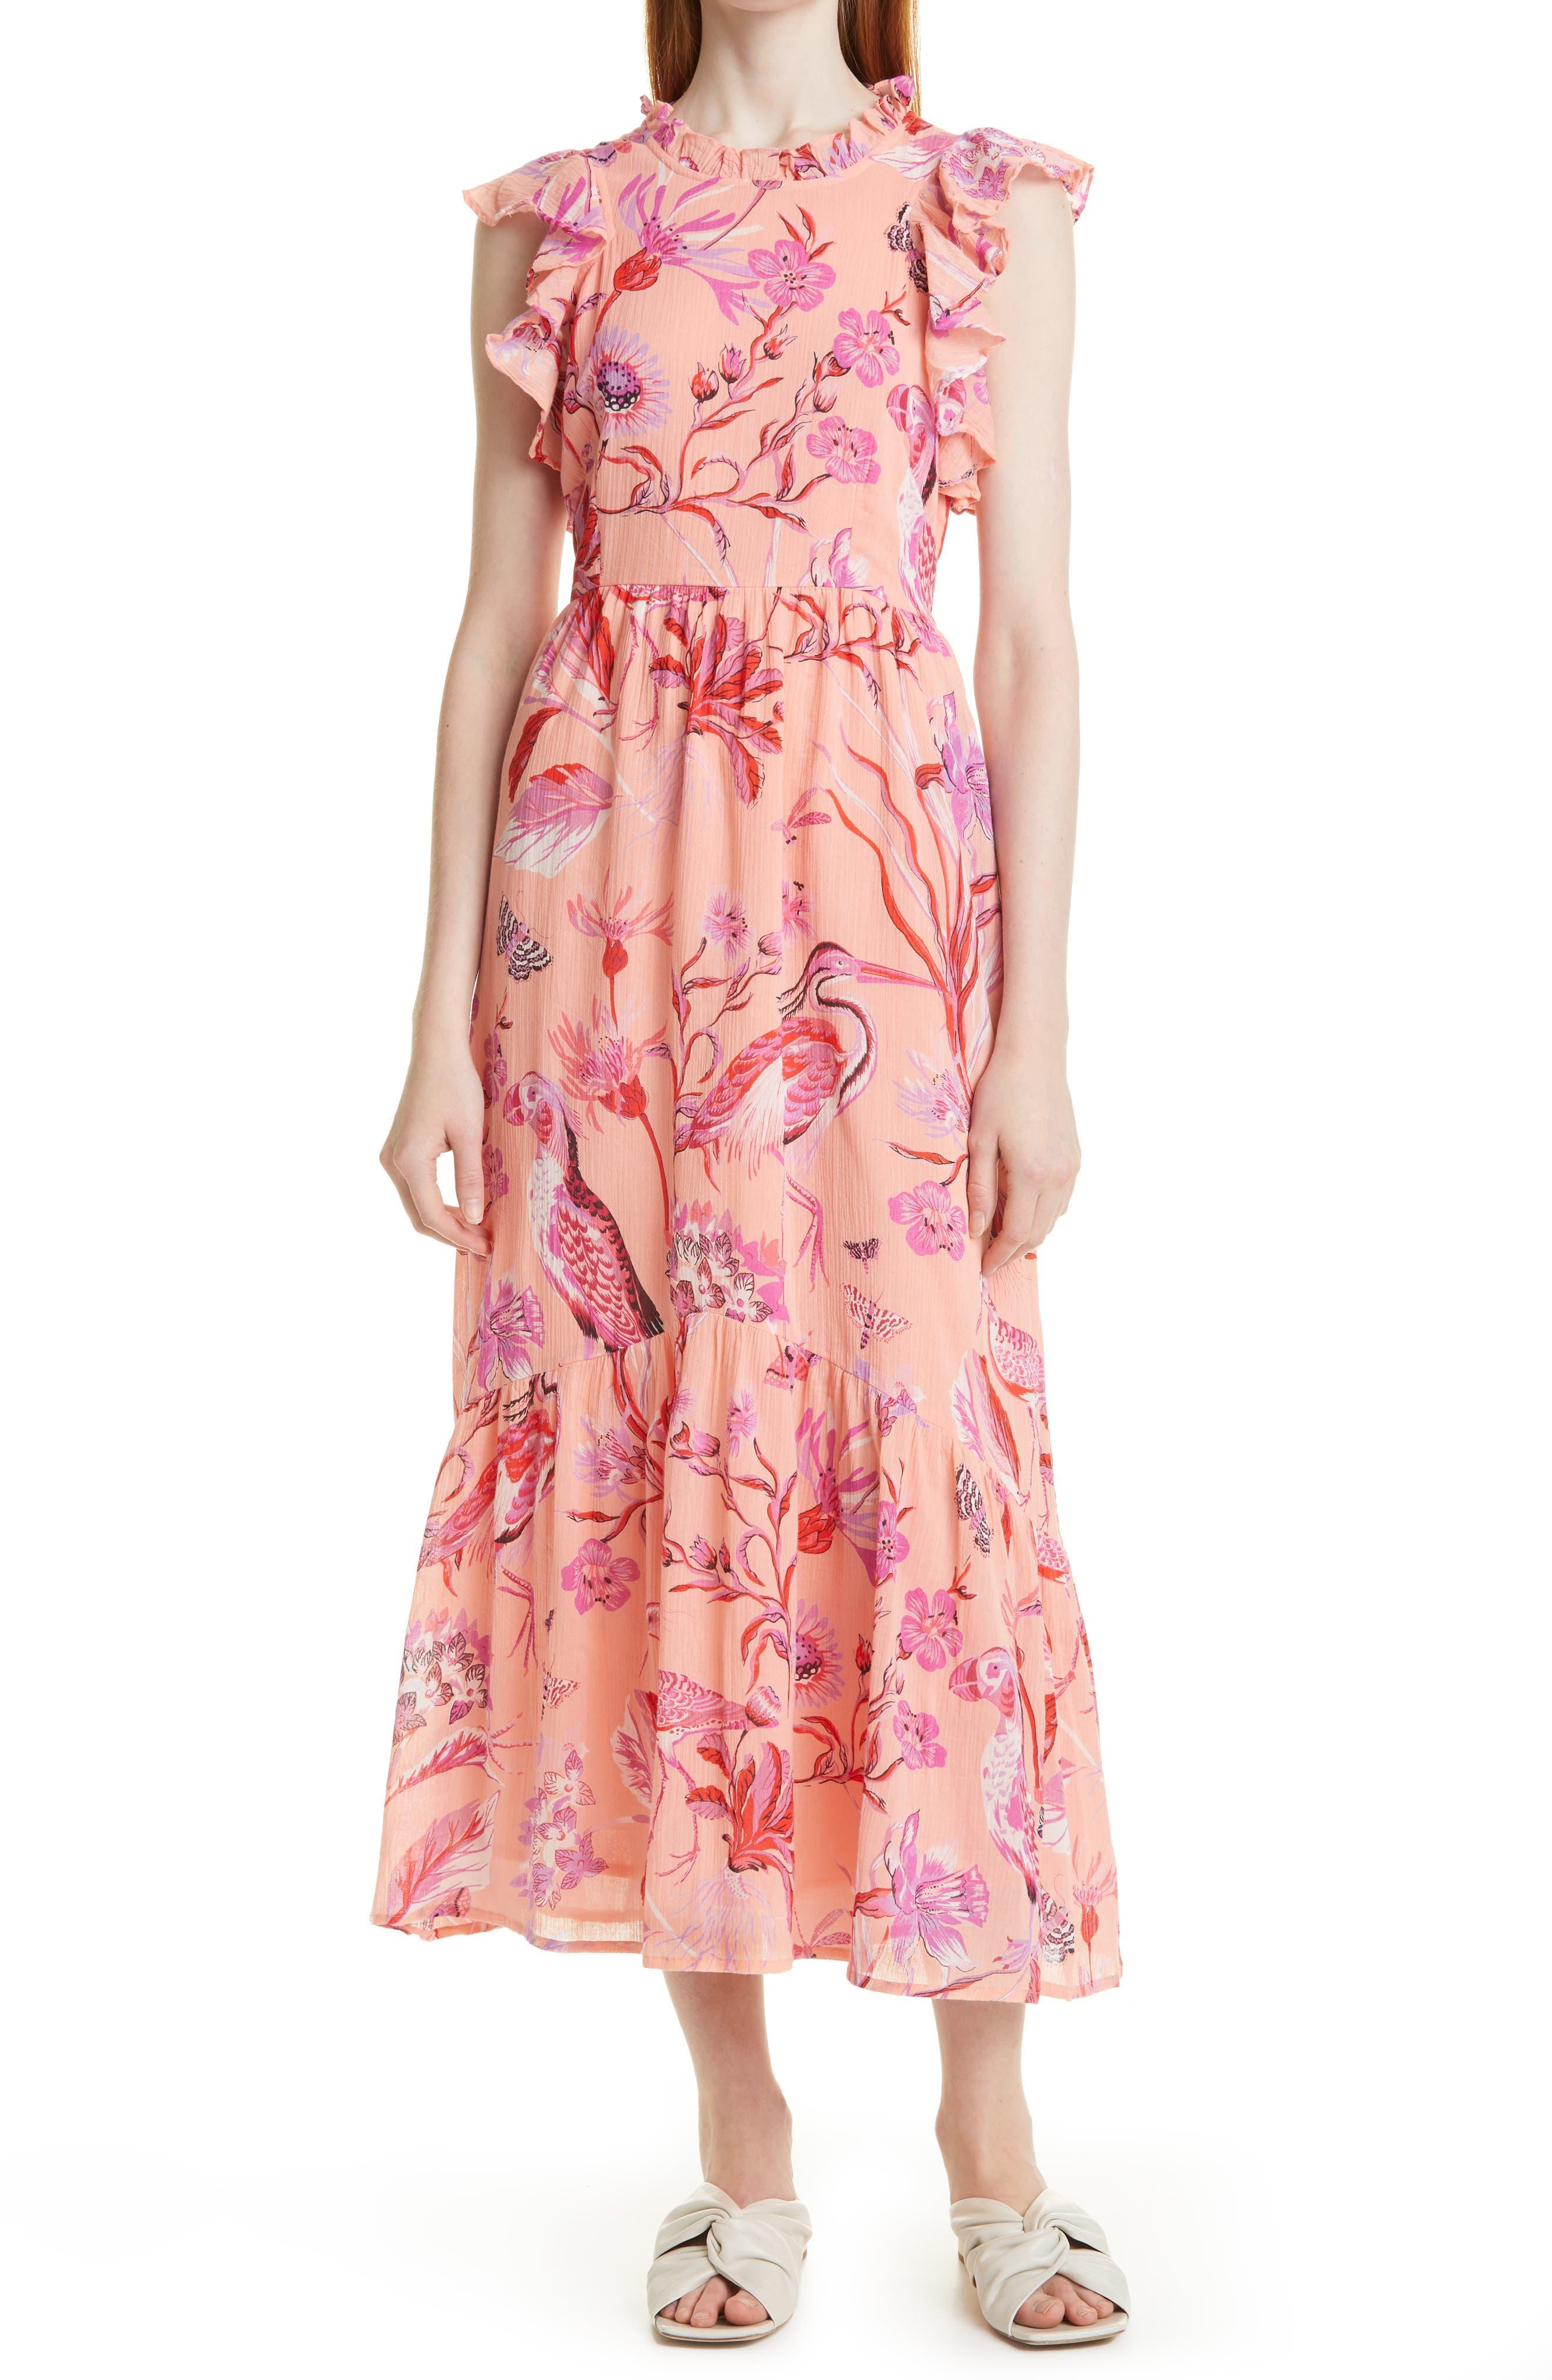 Hanna Floral Ruffle Midi Dress